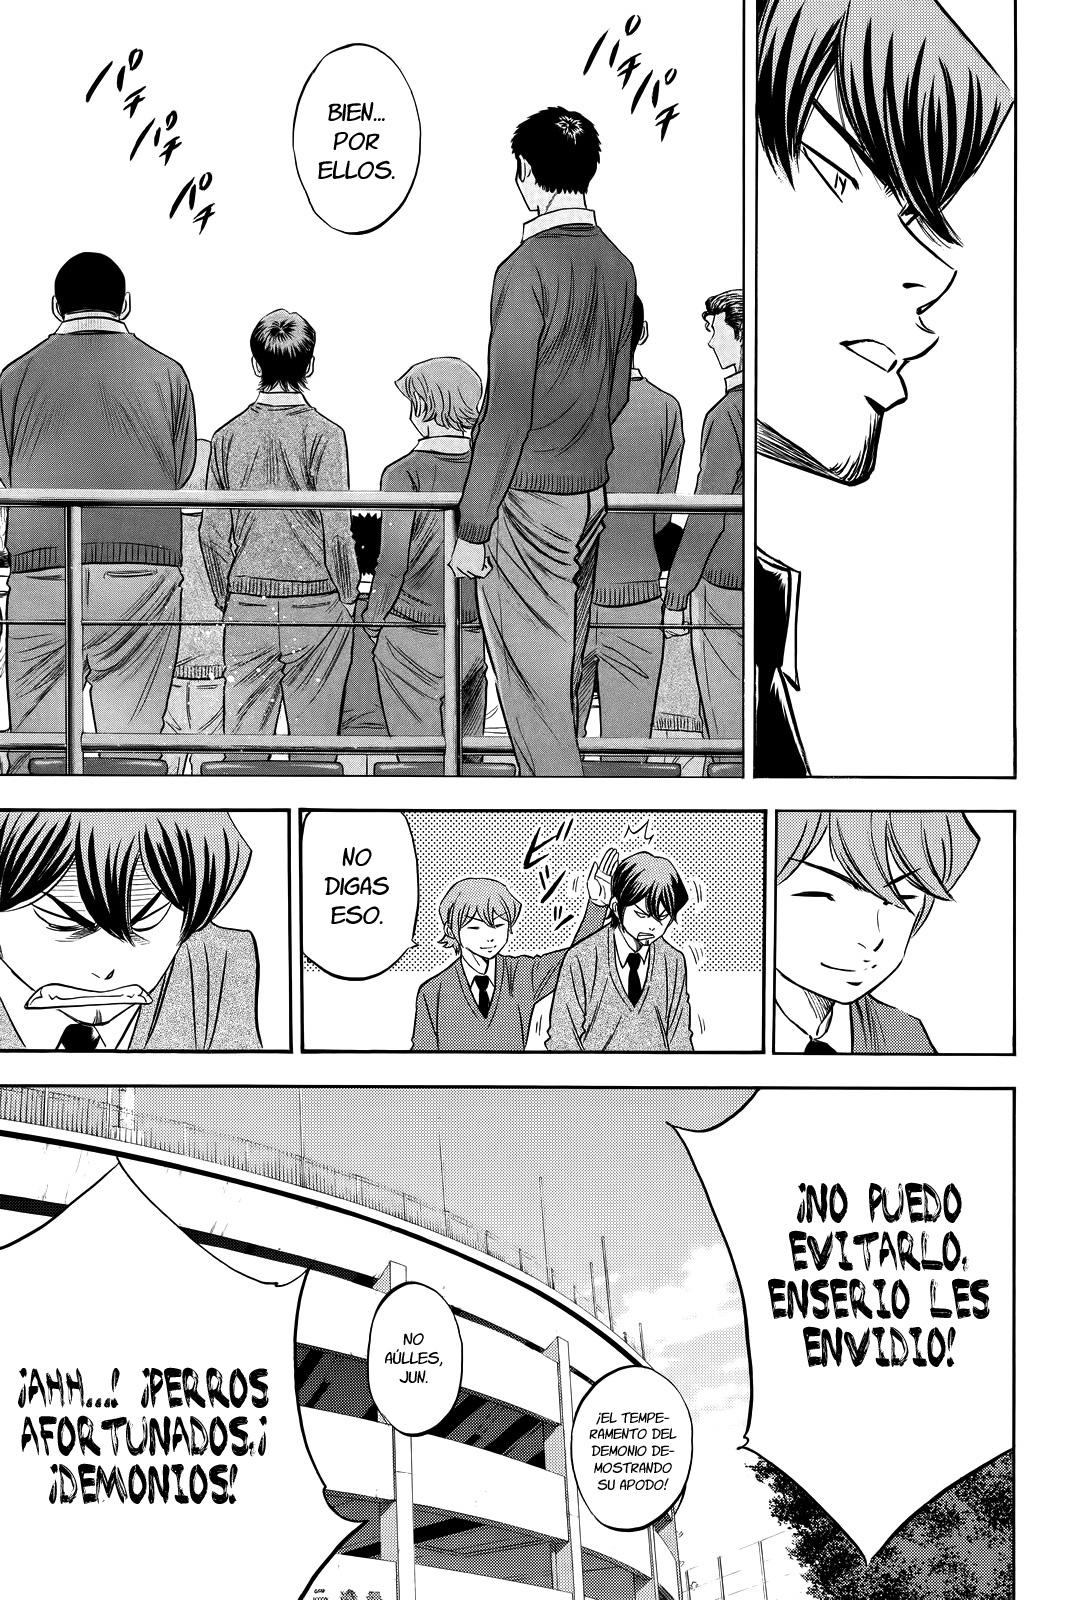 http://c5.ninemanga.com/es_manga/24/1752/416110/598bb634aacec76b3f16edb4bda29a3f.jpg Page 18